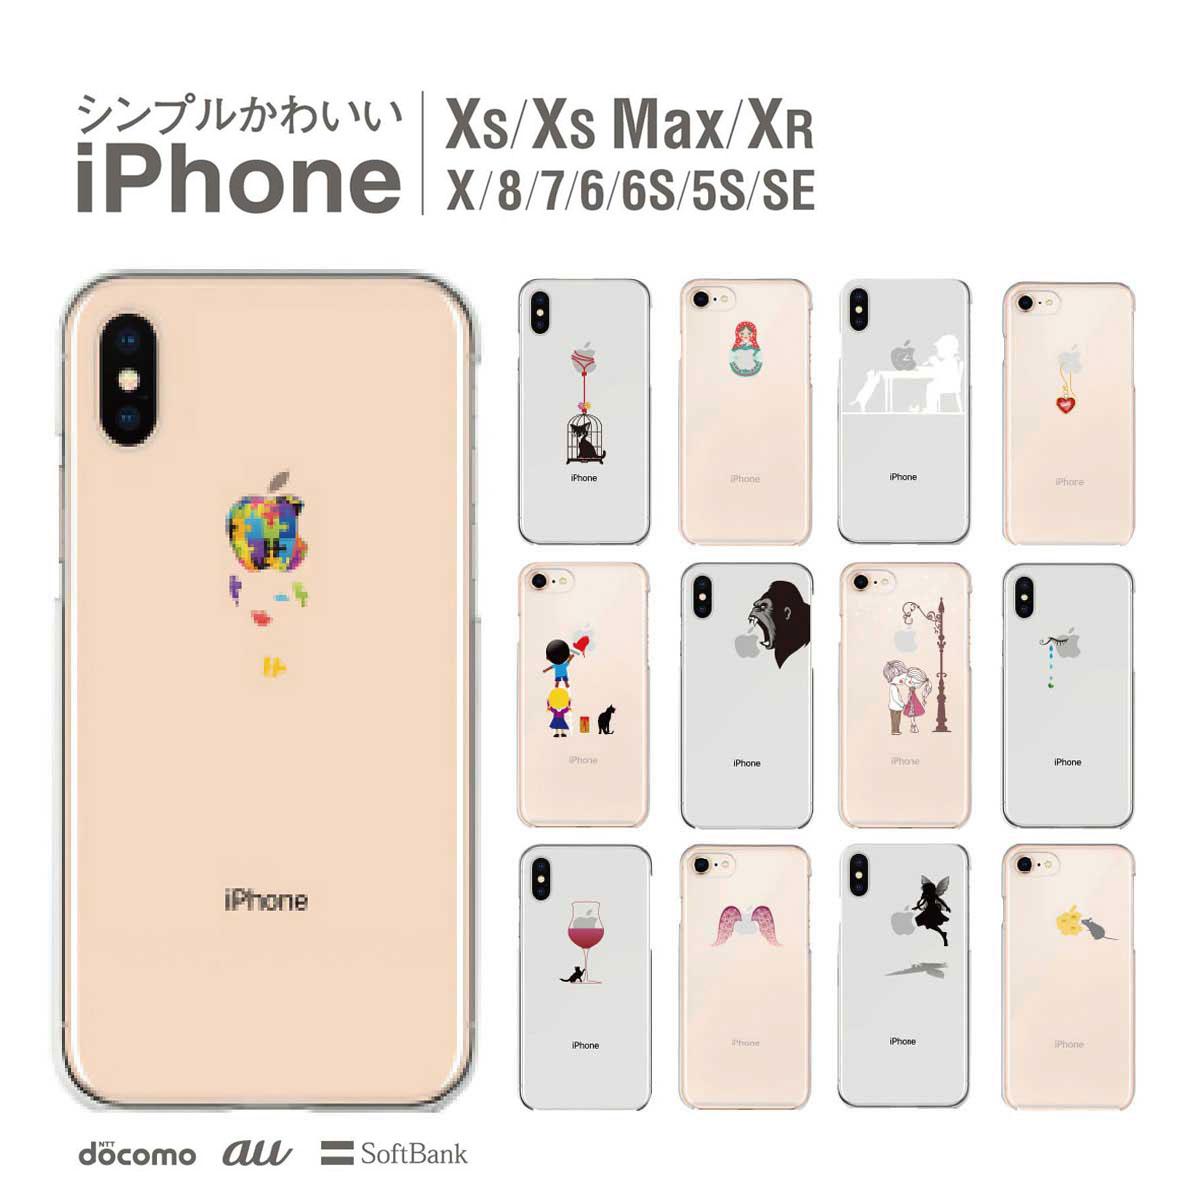 iphoneXSケース iPhoneXS Max iPhoneXR iPhoneX iPhone8 Plus iphone8 ケース iPhone iphone7ケース iphone7 iphone7s Plus iPhone6s iPhone6 Plus iphoneSE ケース iPhone5s スマホケース ハードケース カバー かわいい 97-ip6-008